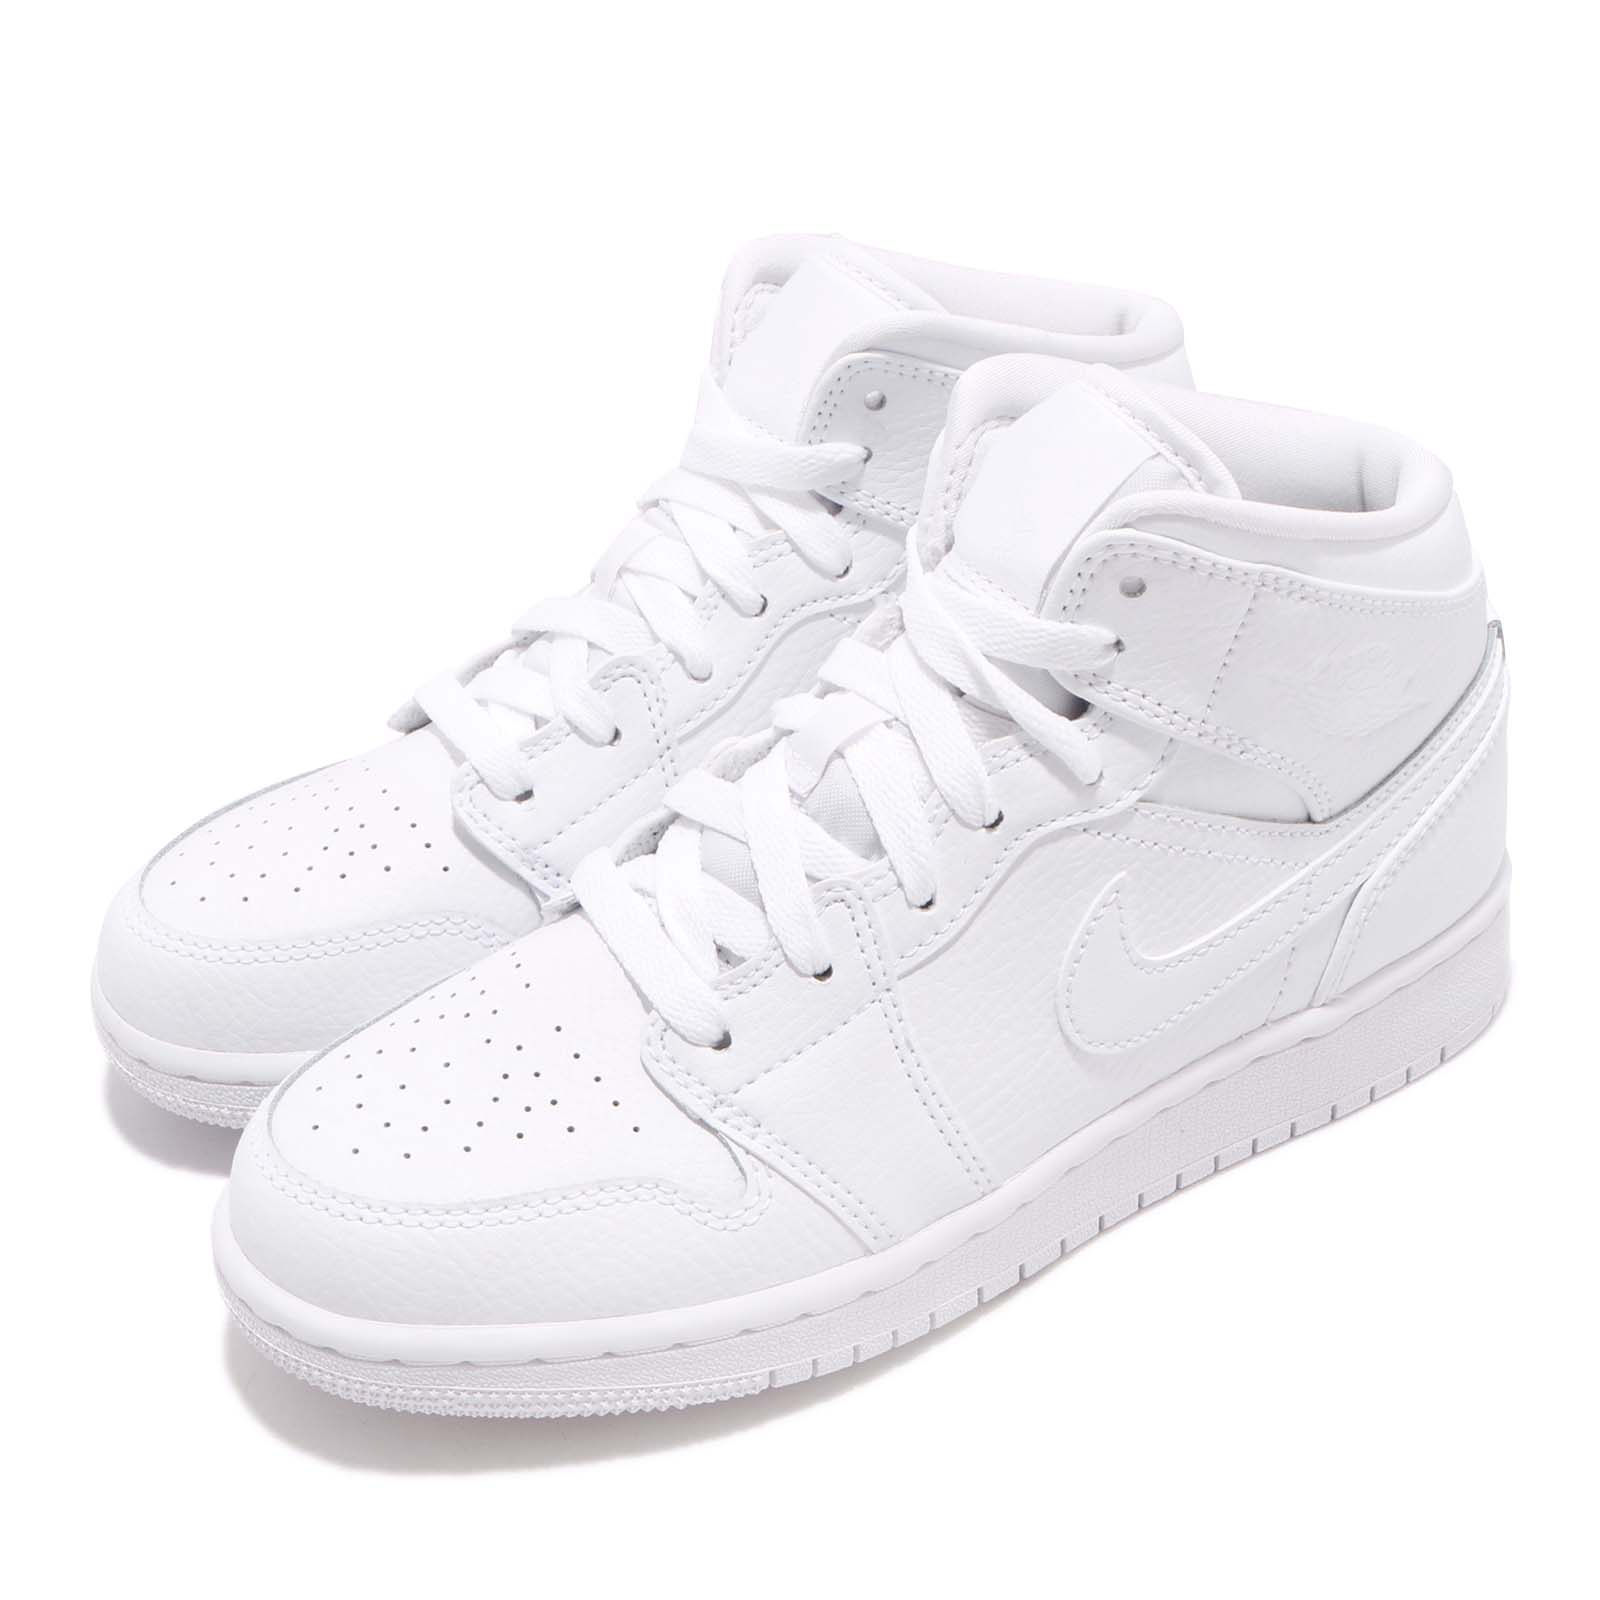 Nike Air Jordan 1 Mid 女鞋 554725-129